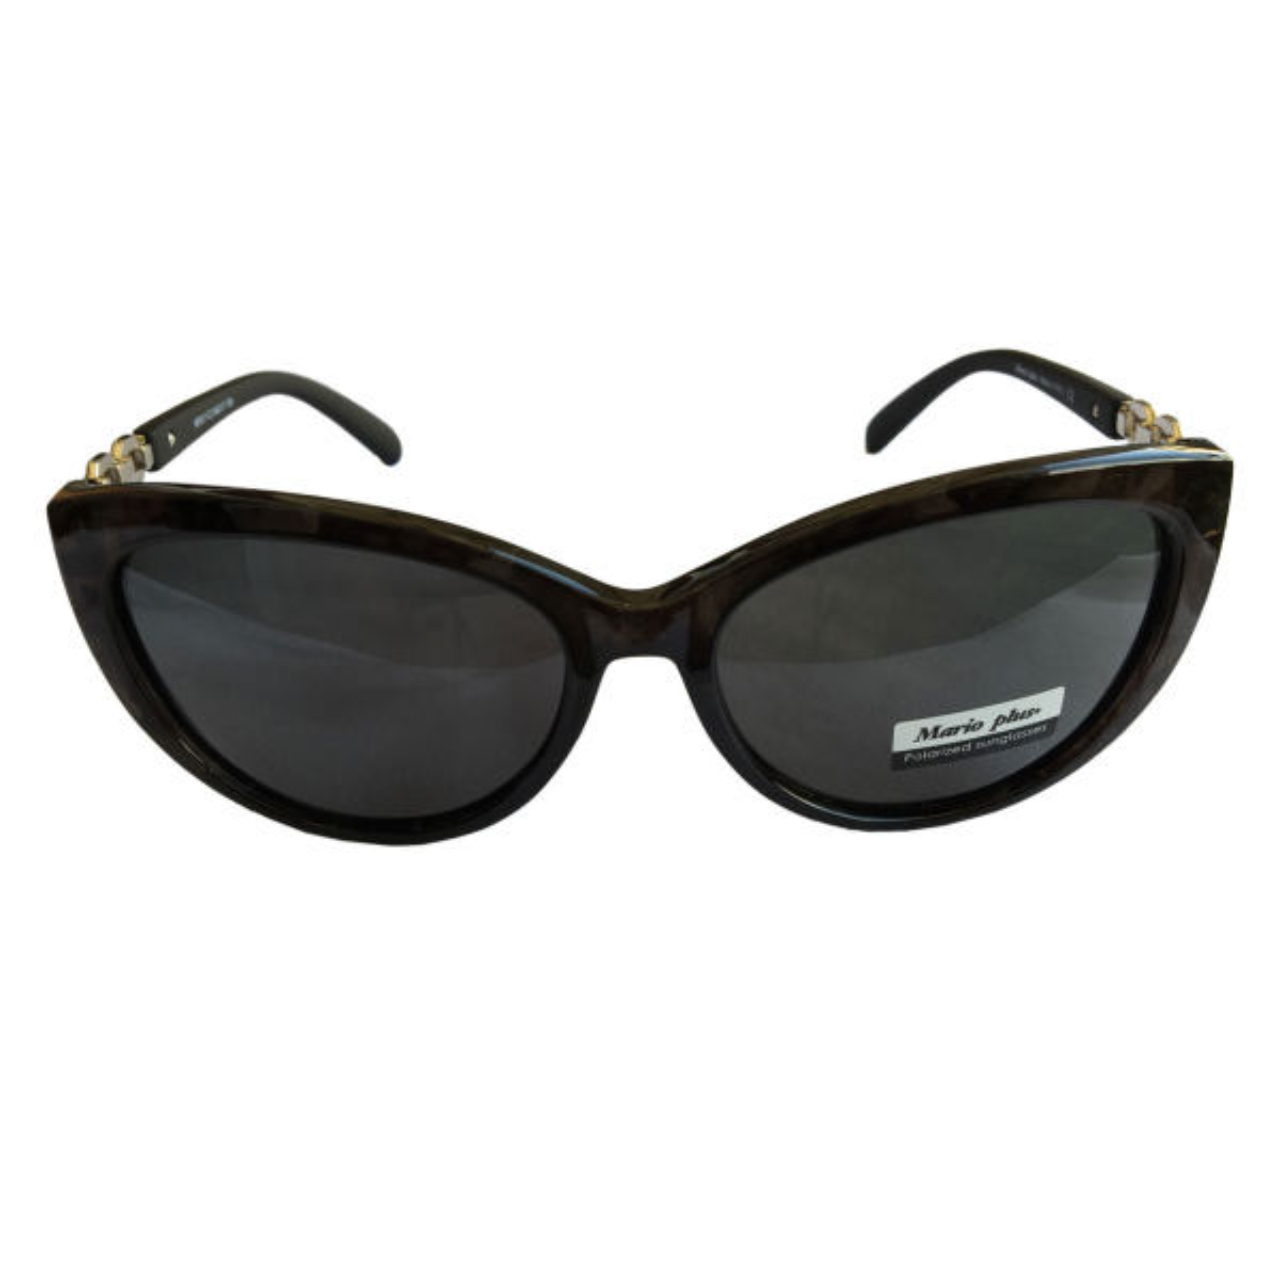 عینک آفتابی زنانه ماریو پلاس مدل 11